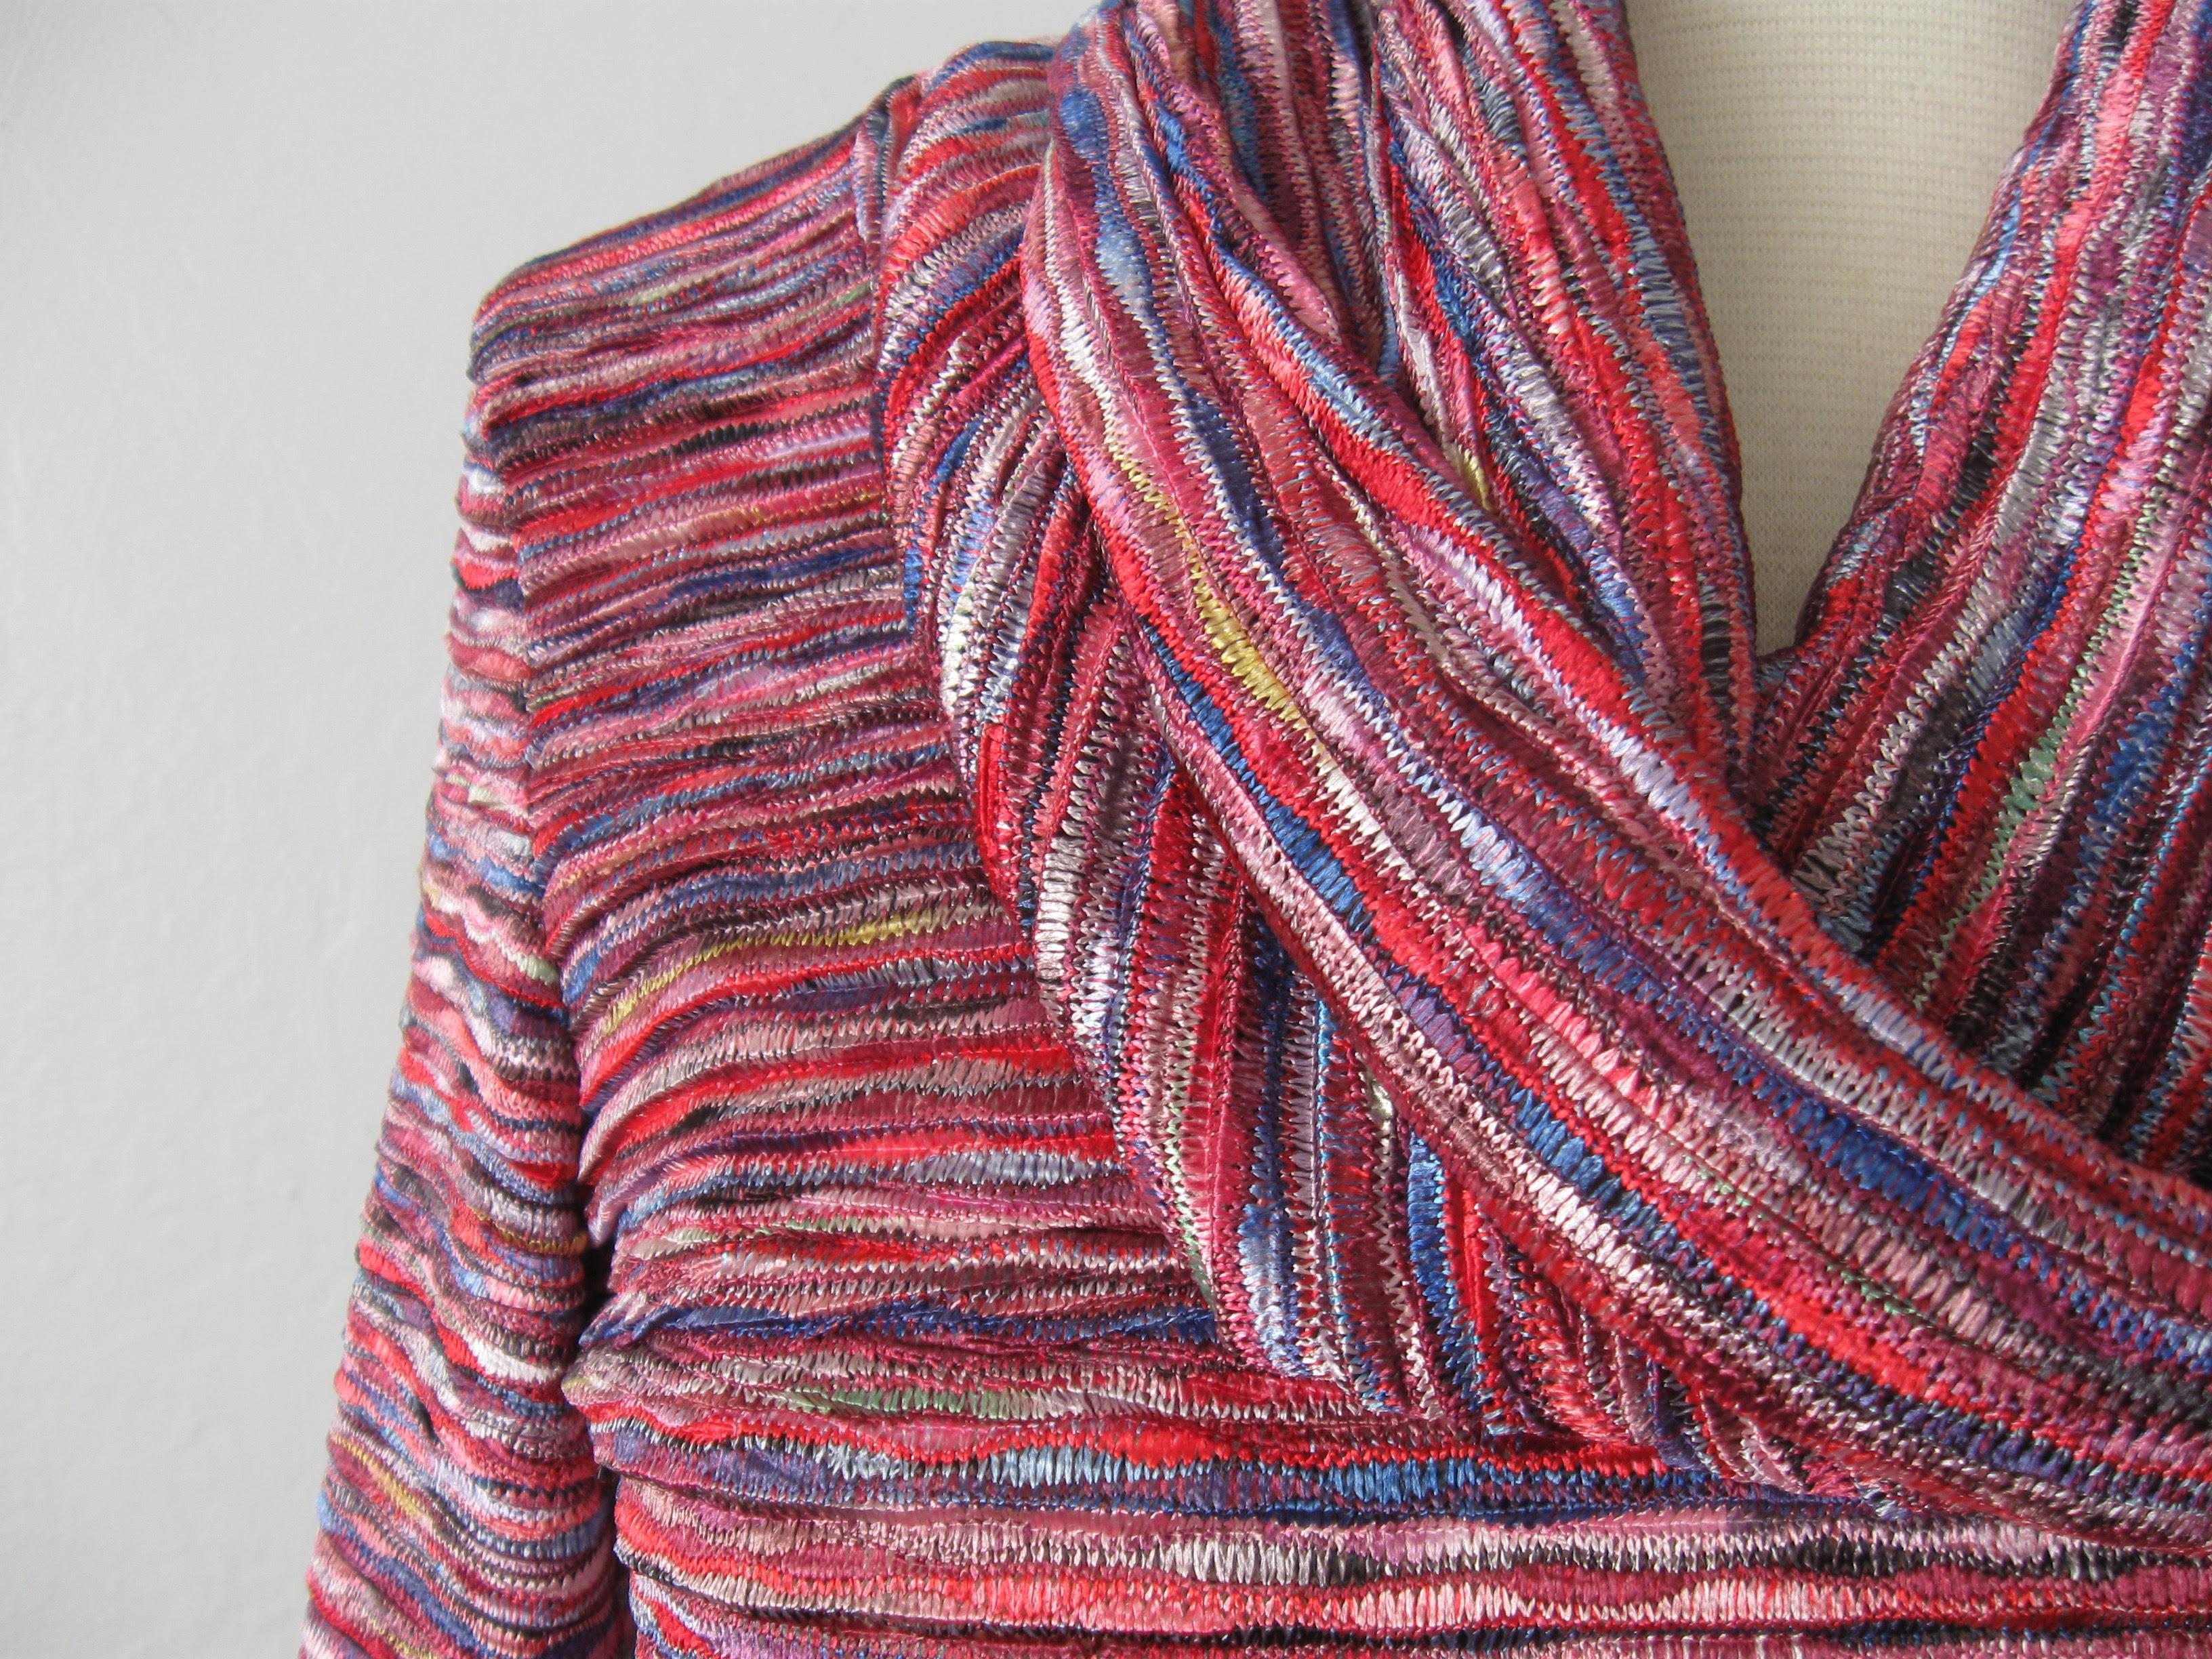 Renfrew fabric tunic